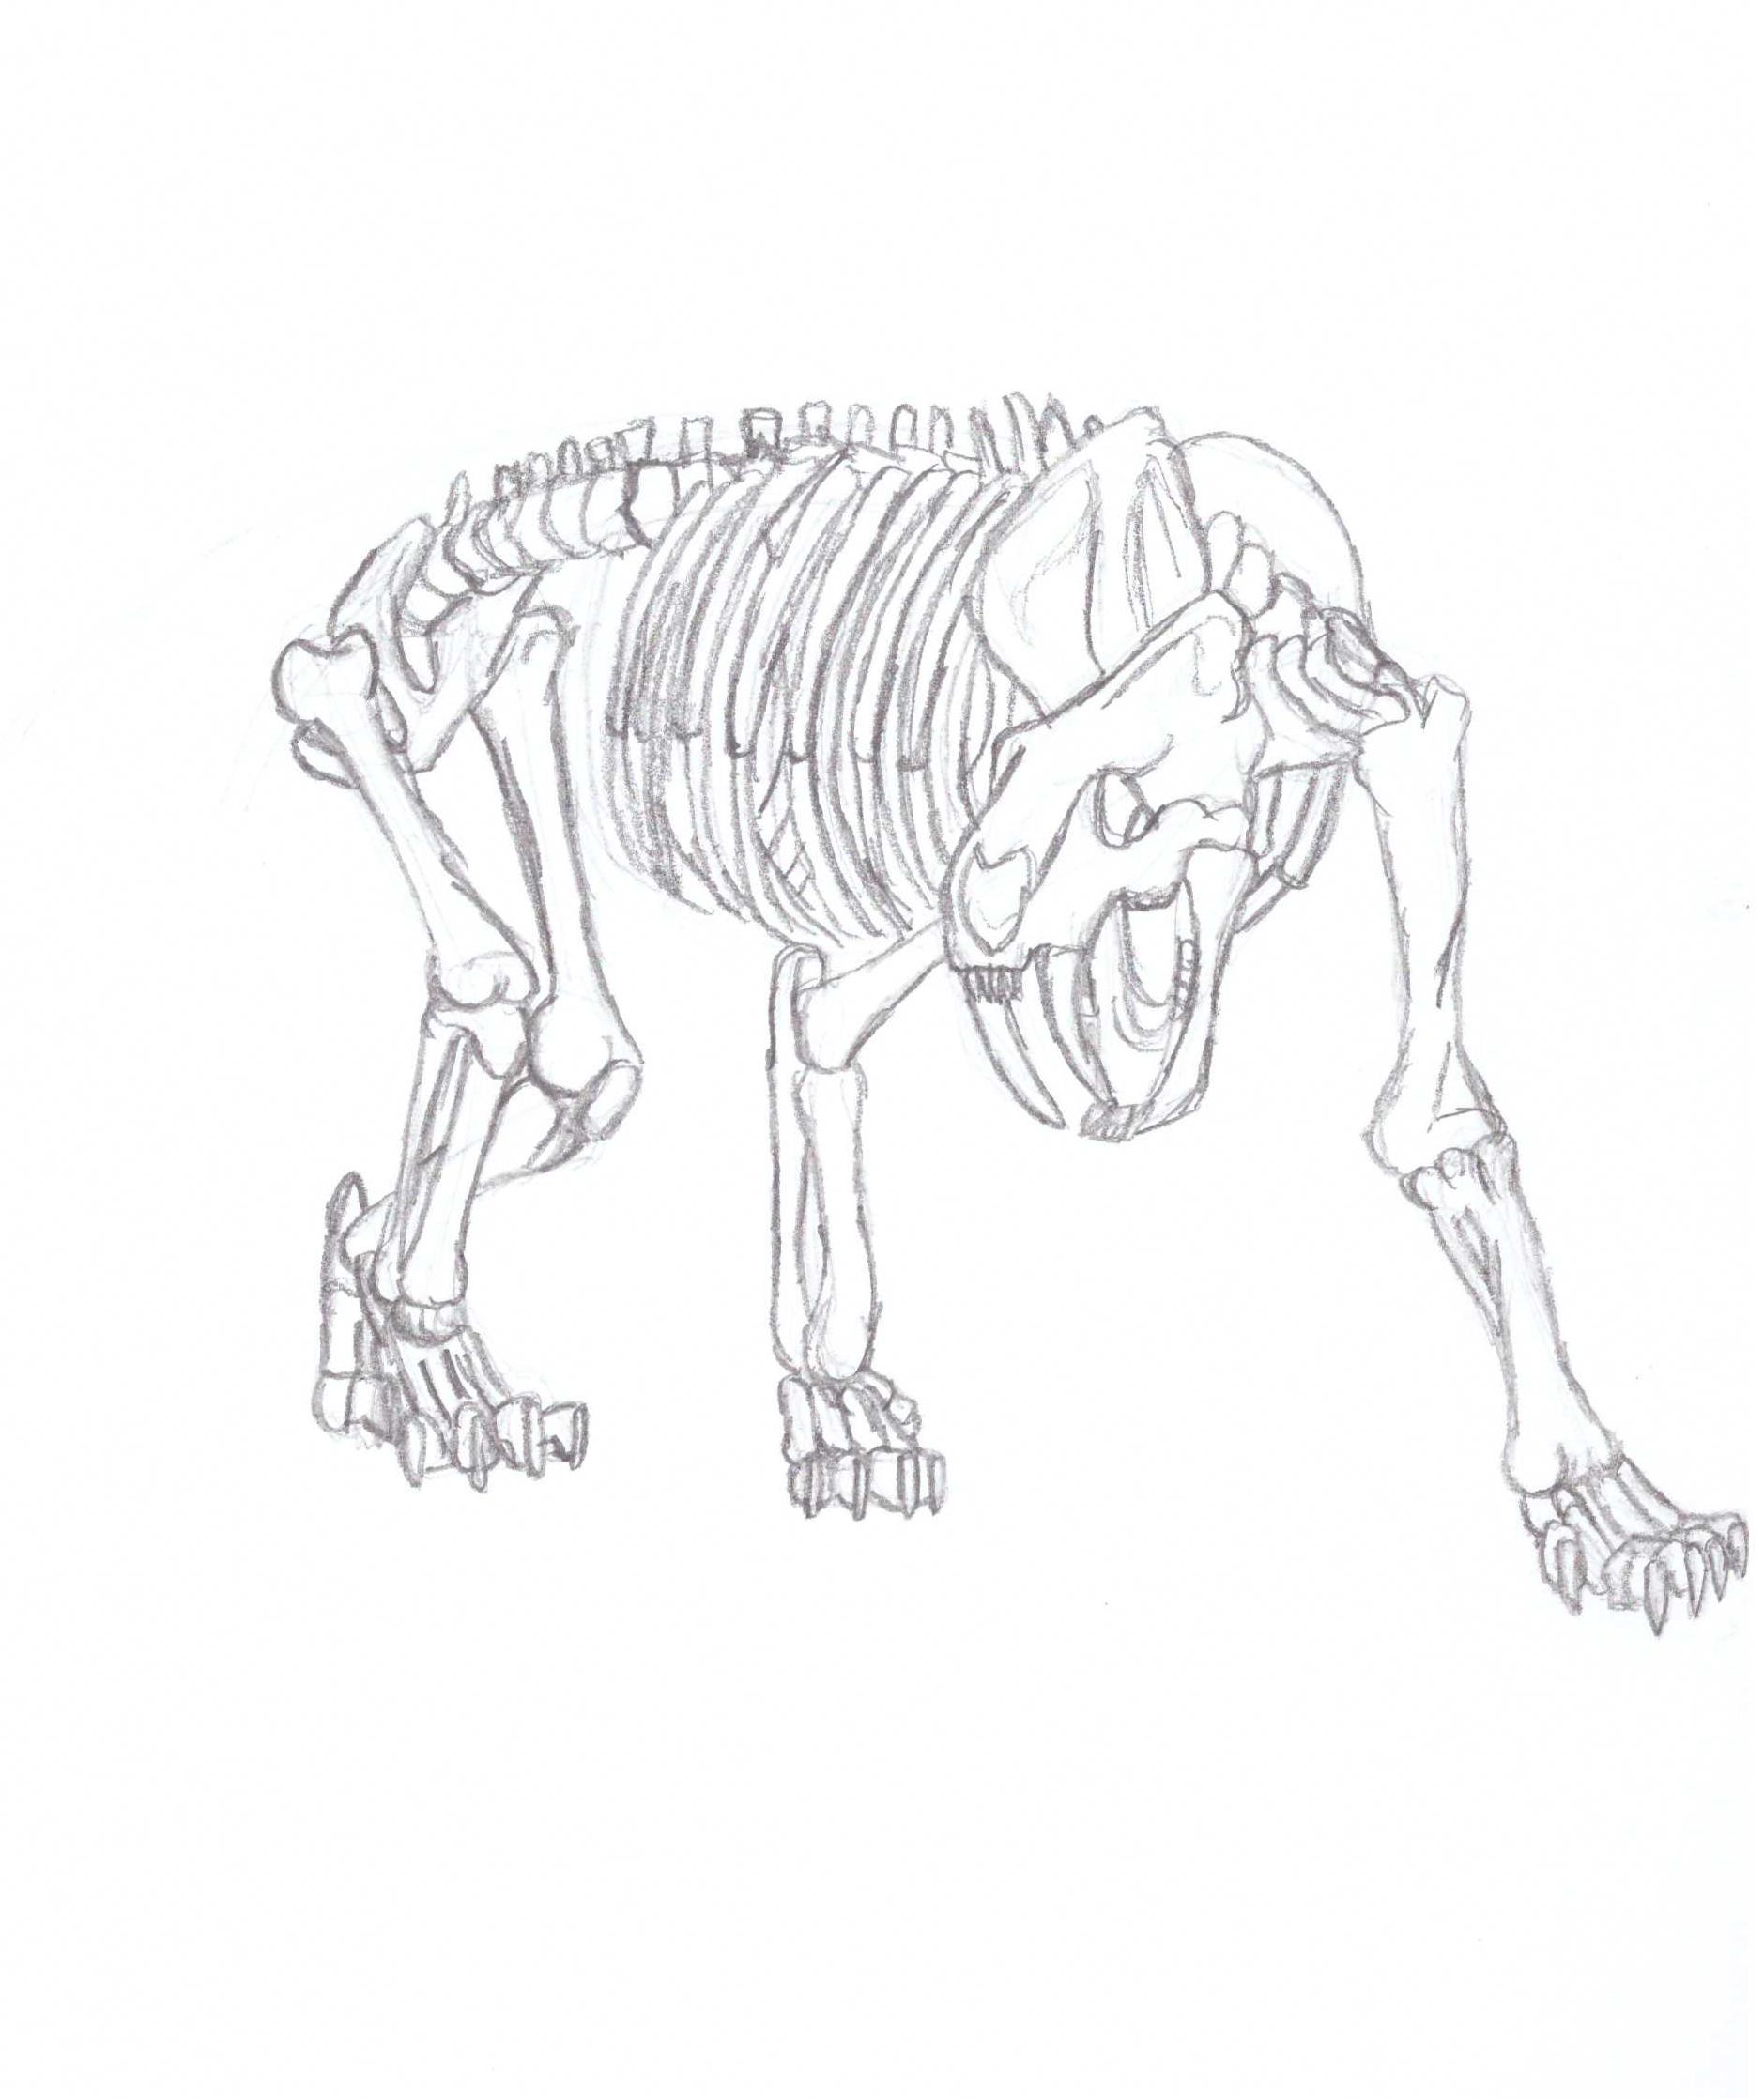 Saber-tooth Tiger